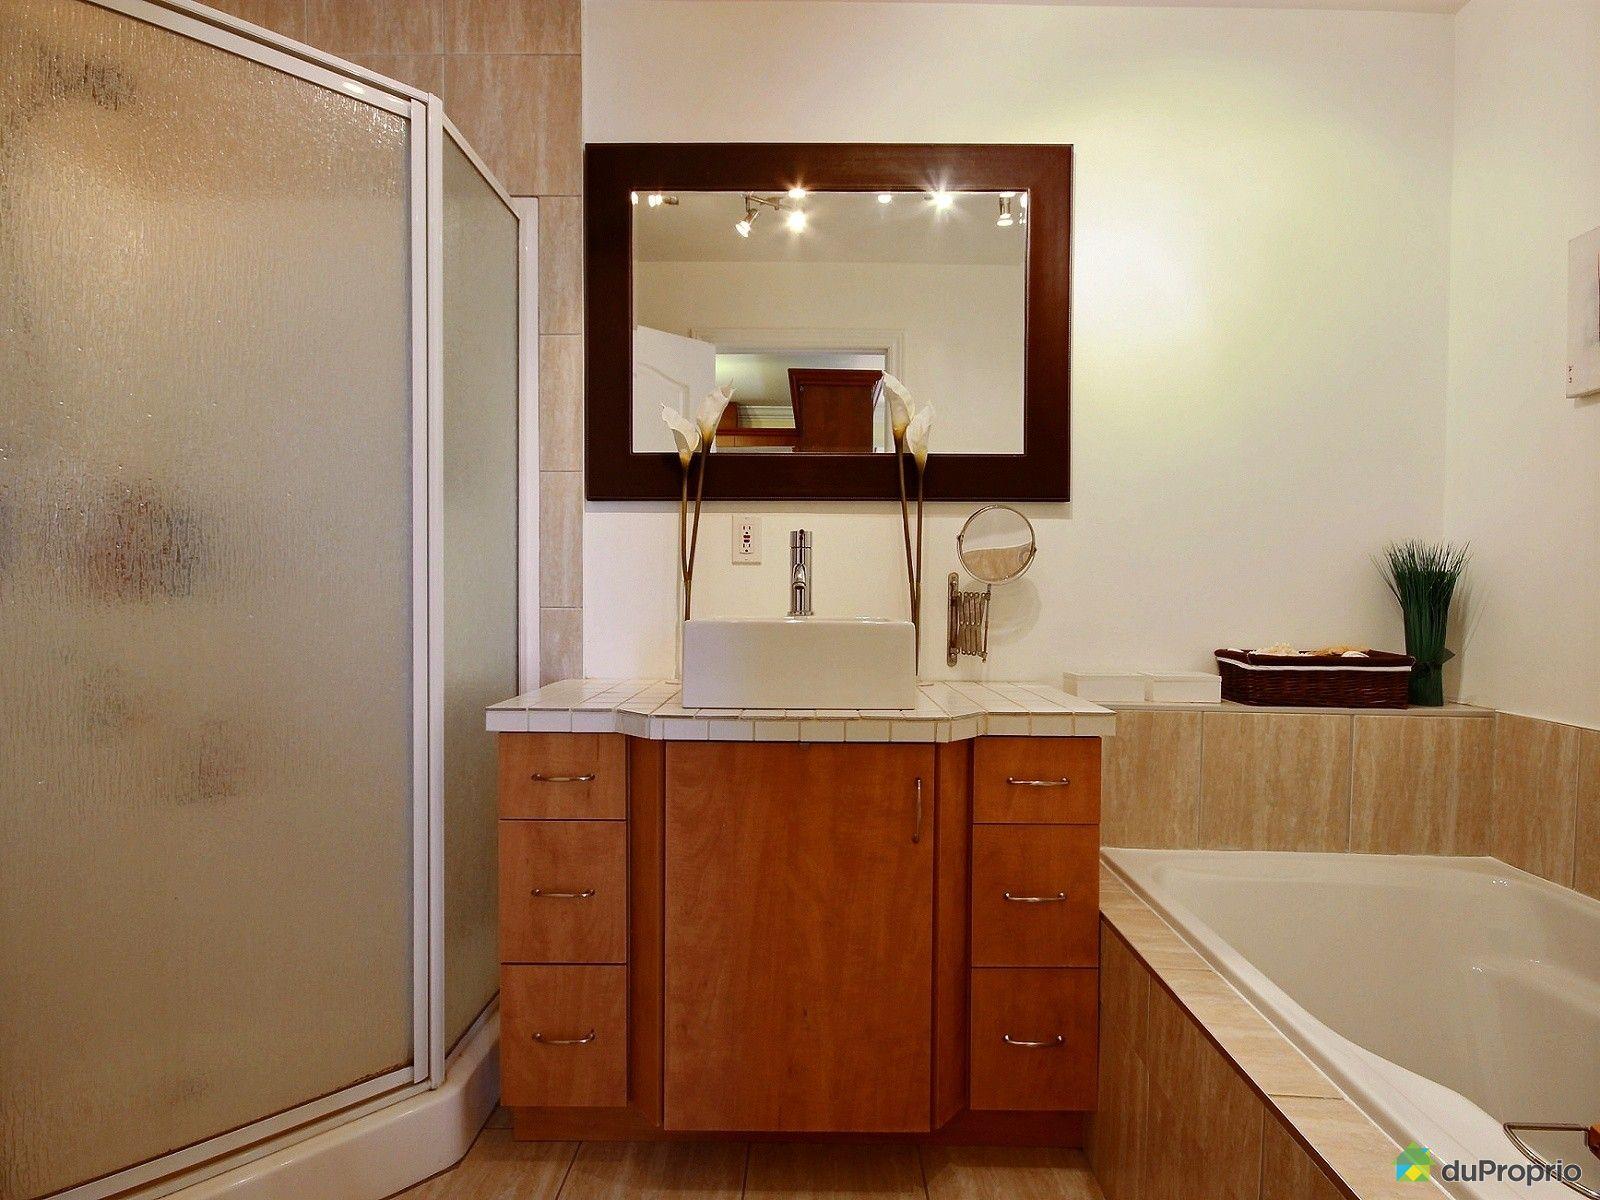 condo vendre montr al 2700 avenue charlemagne immobilier qu bec duproprio 506953. Black Bedroom Furniture Sets. Home Design Ideas